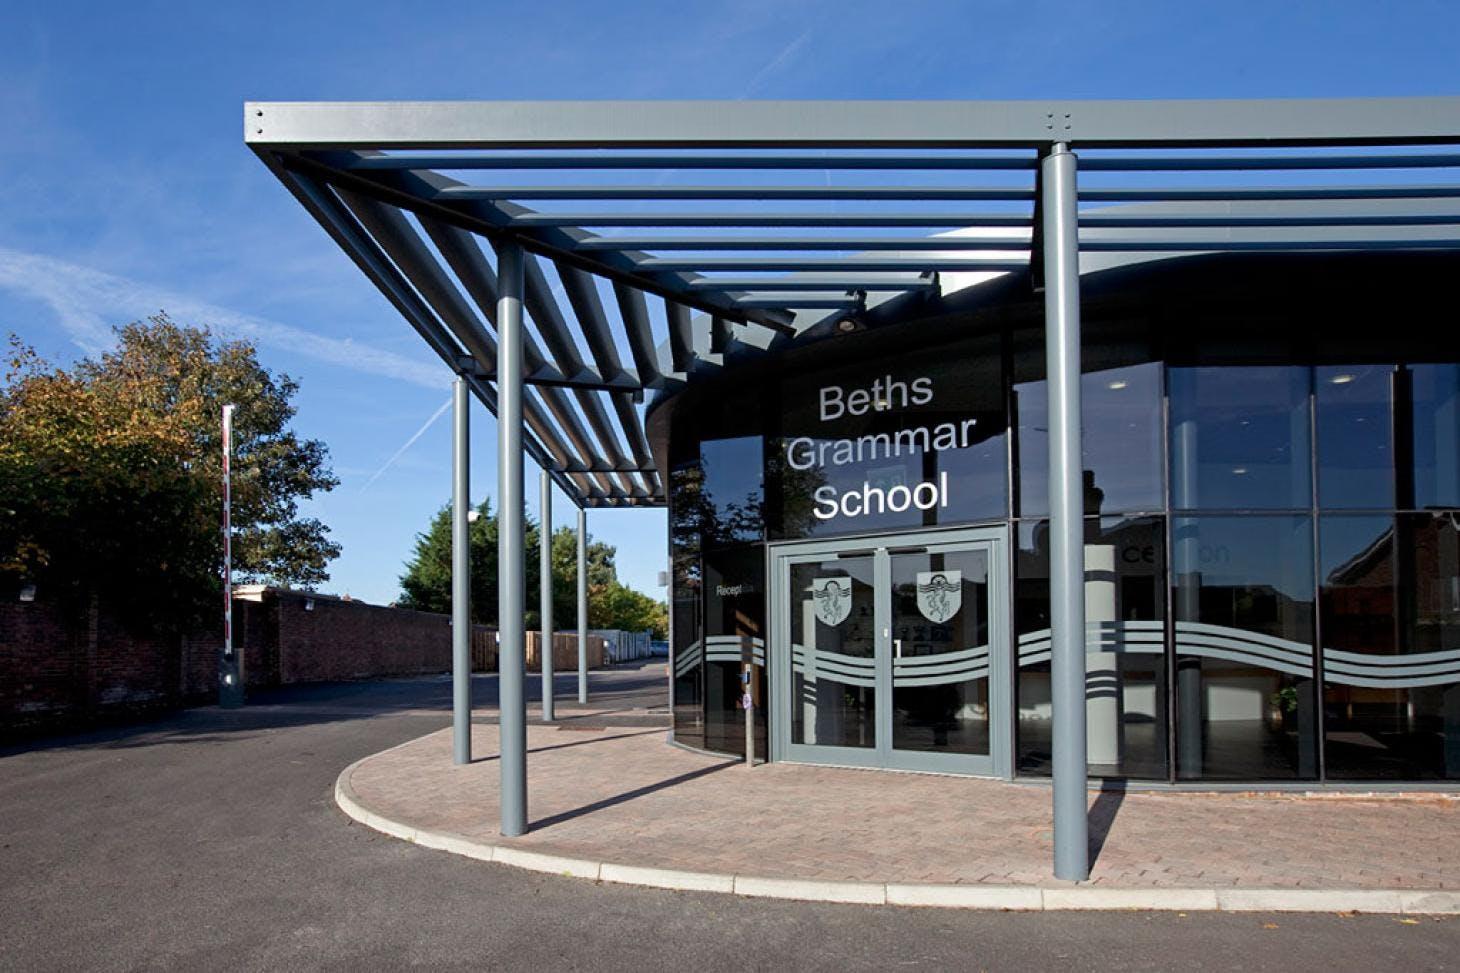 Beths Grammar School 11 a side | Grass football pitch